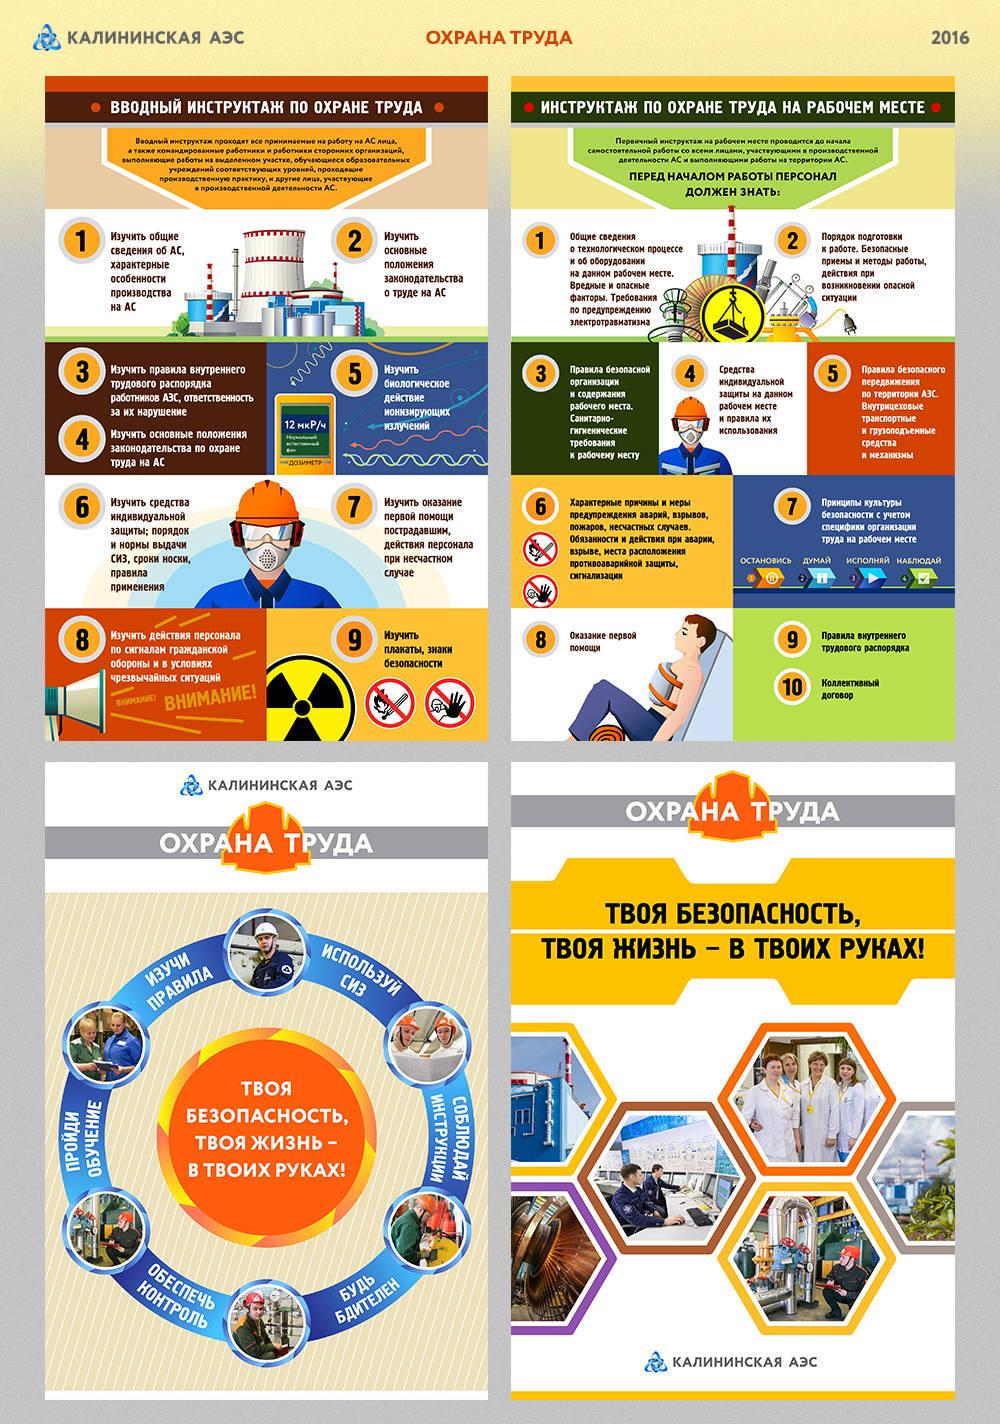 Оформление плакатов и баннеров по теме Охрана труда на АЭС